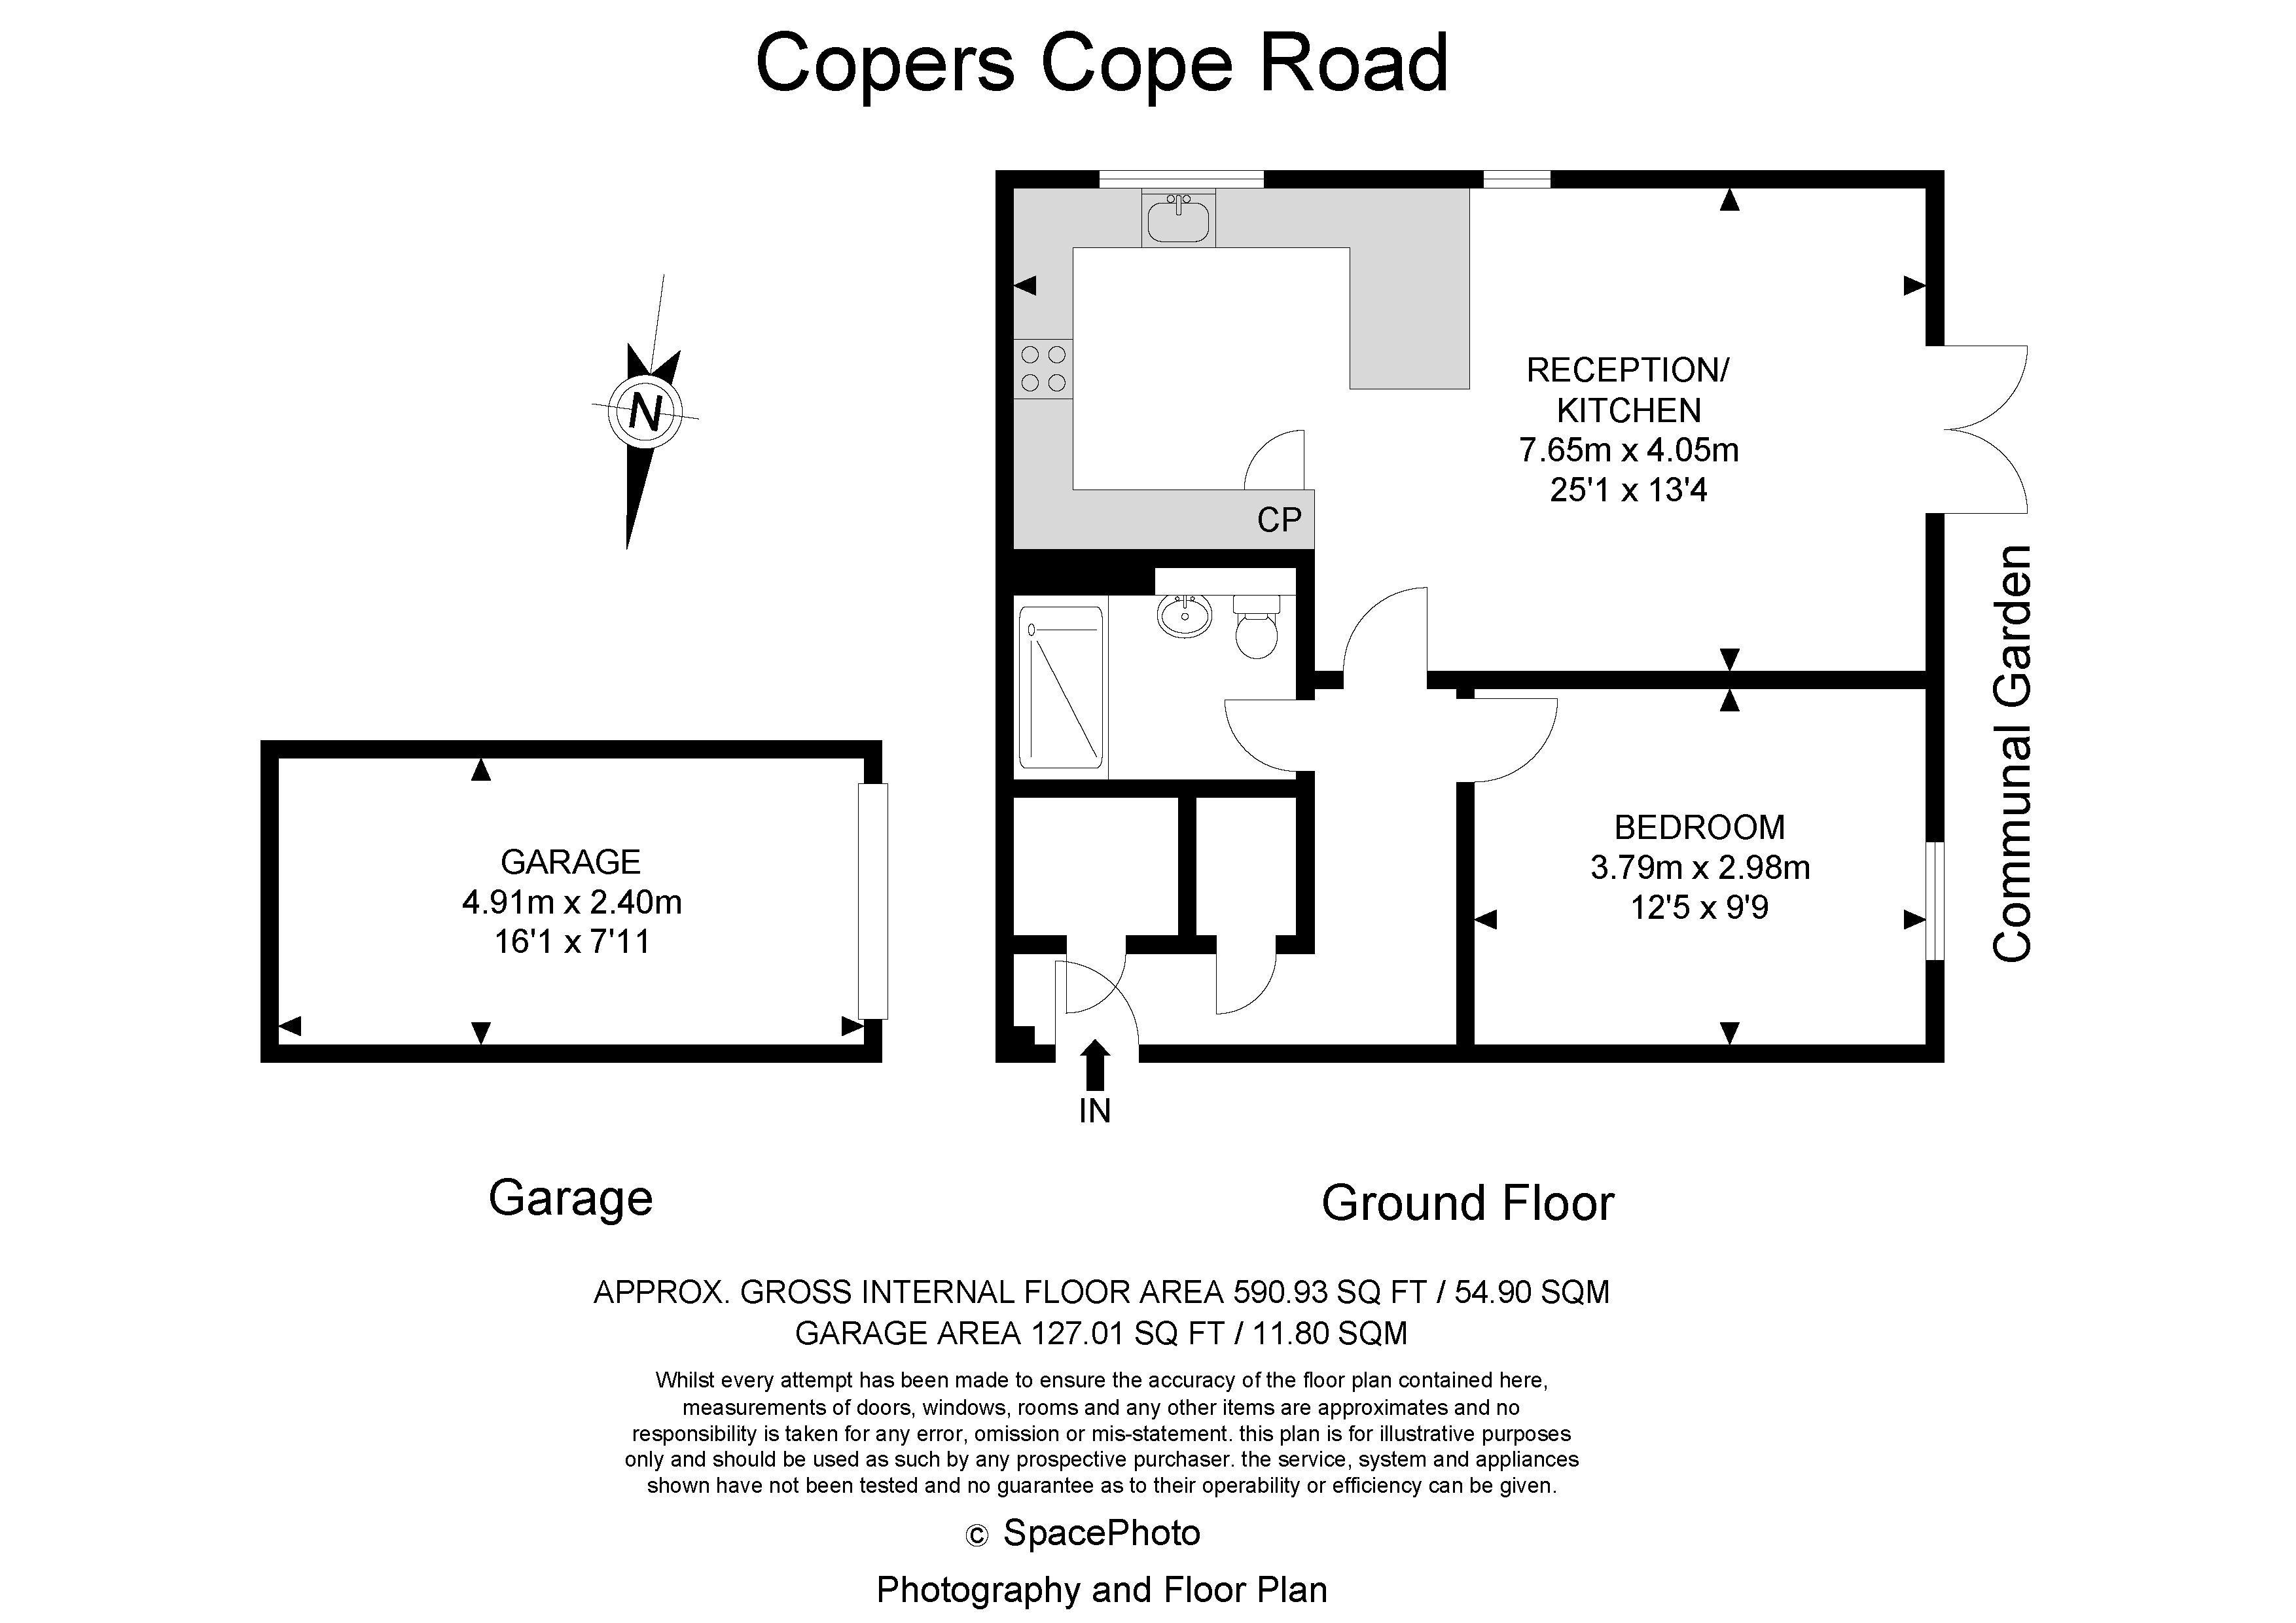 Copers Cope Road